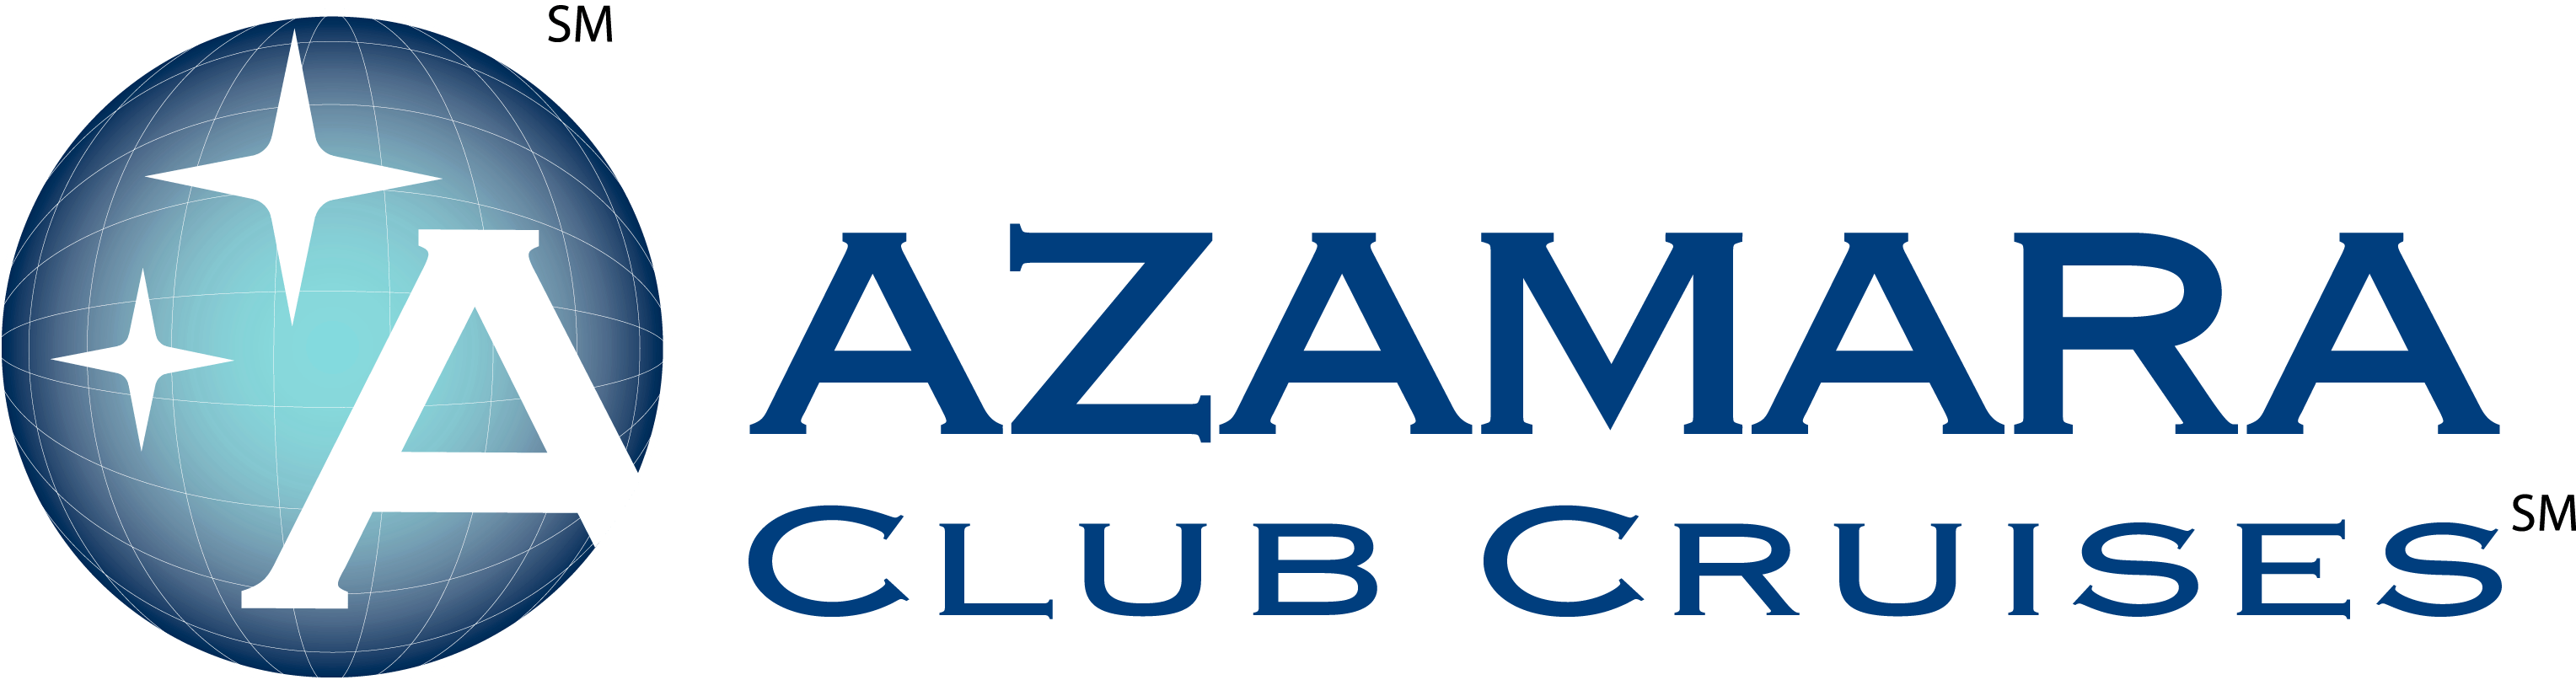 Azamara Club Cruises Logo png